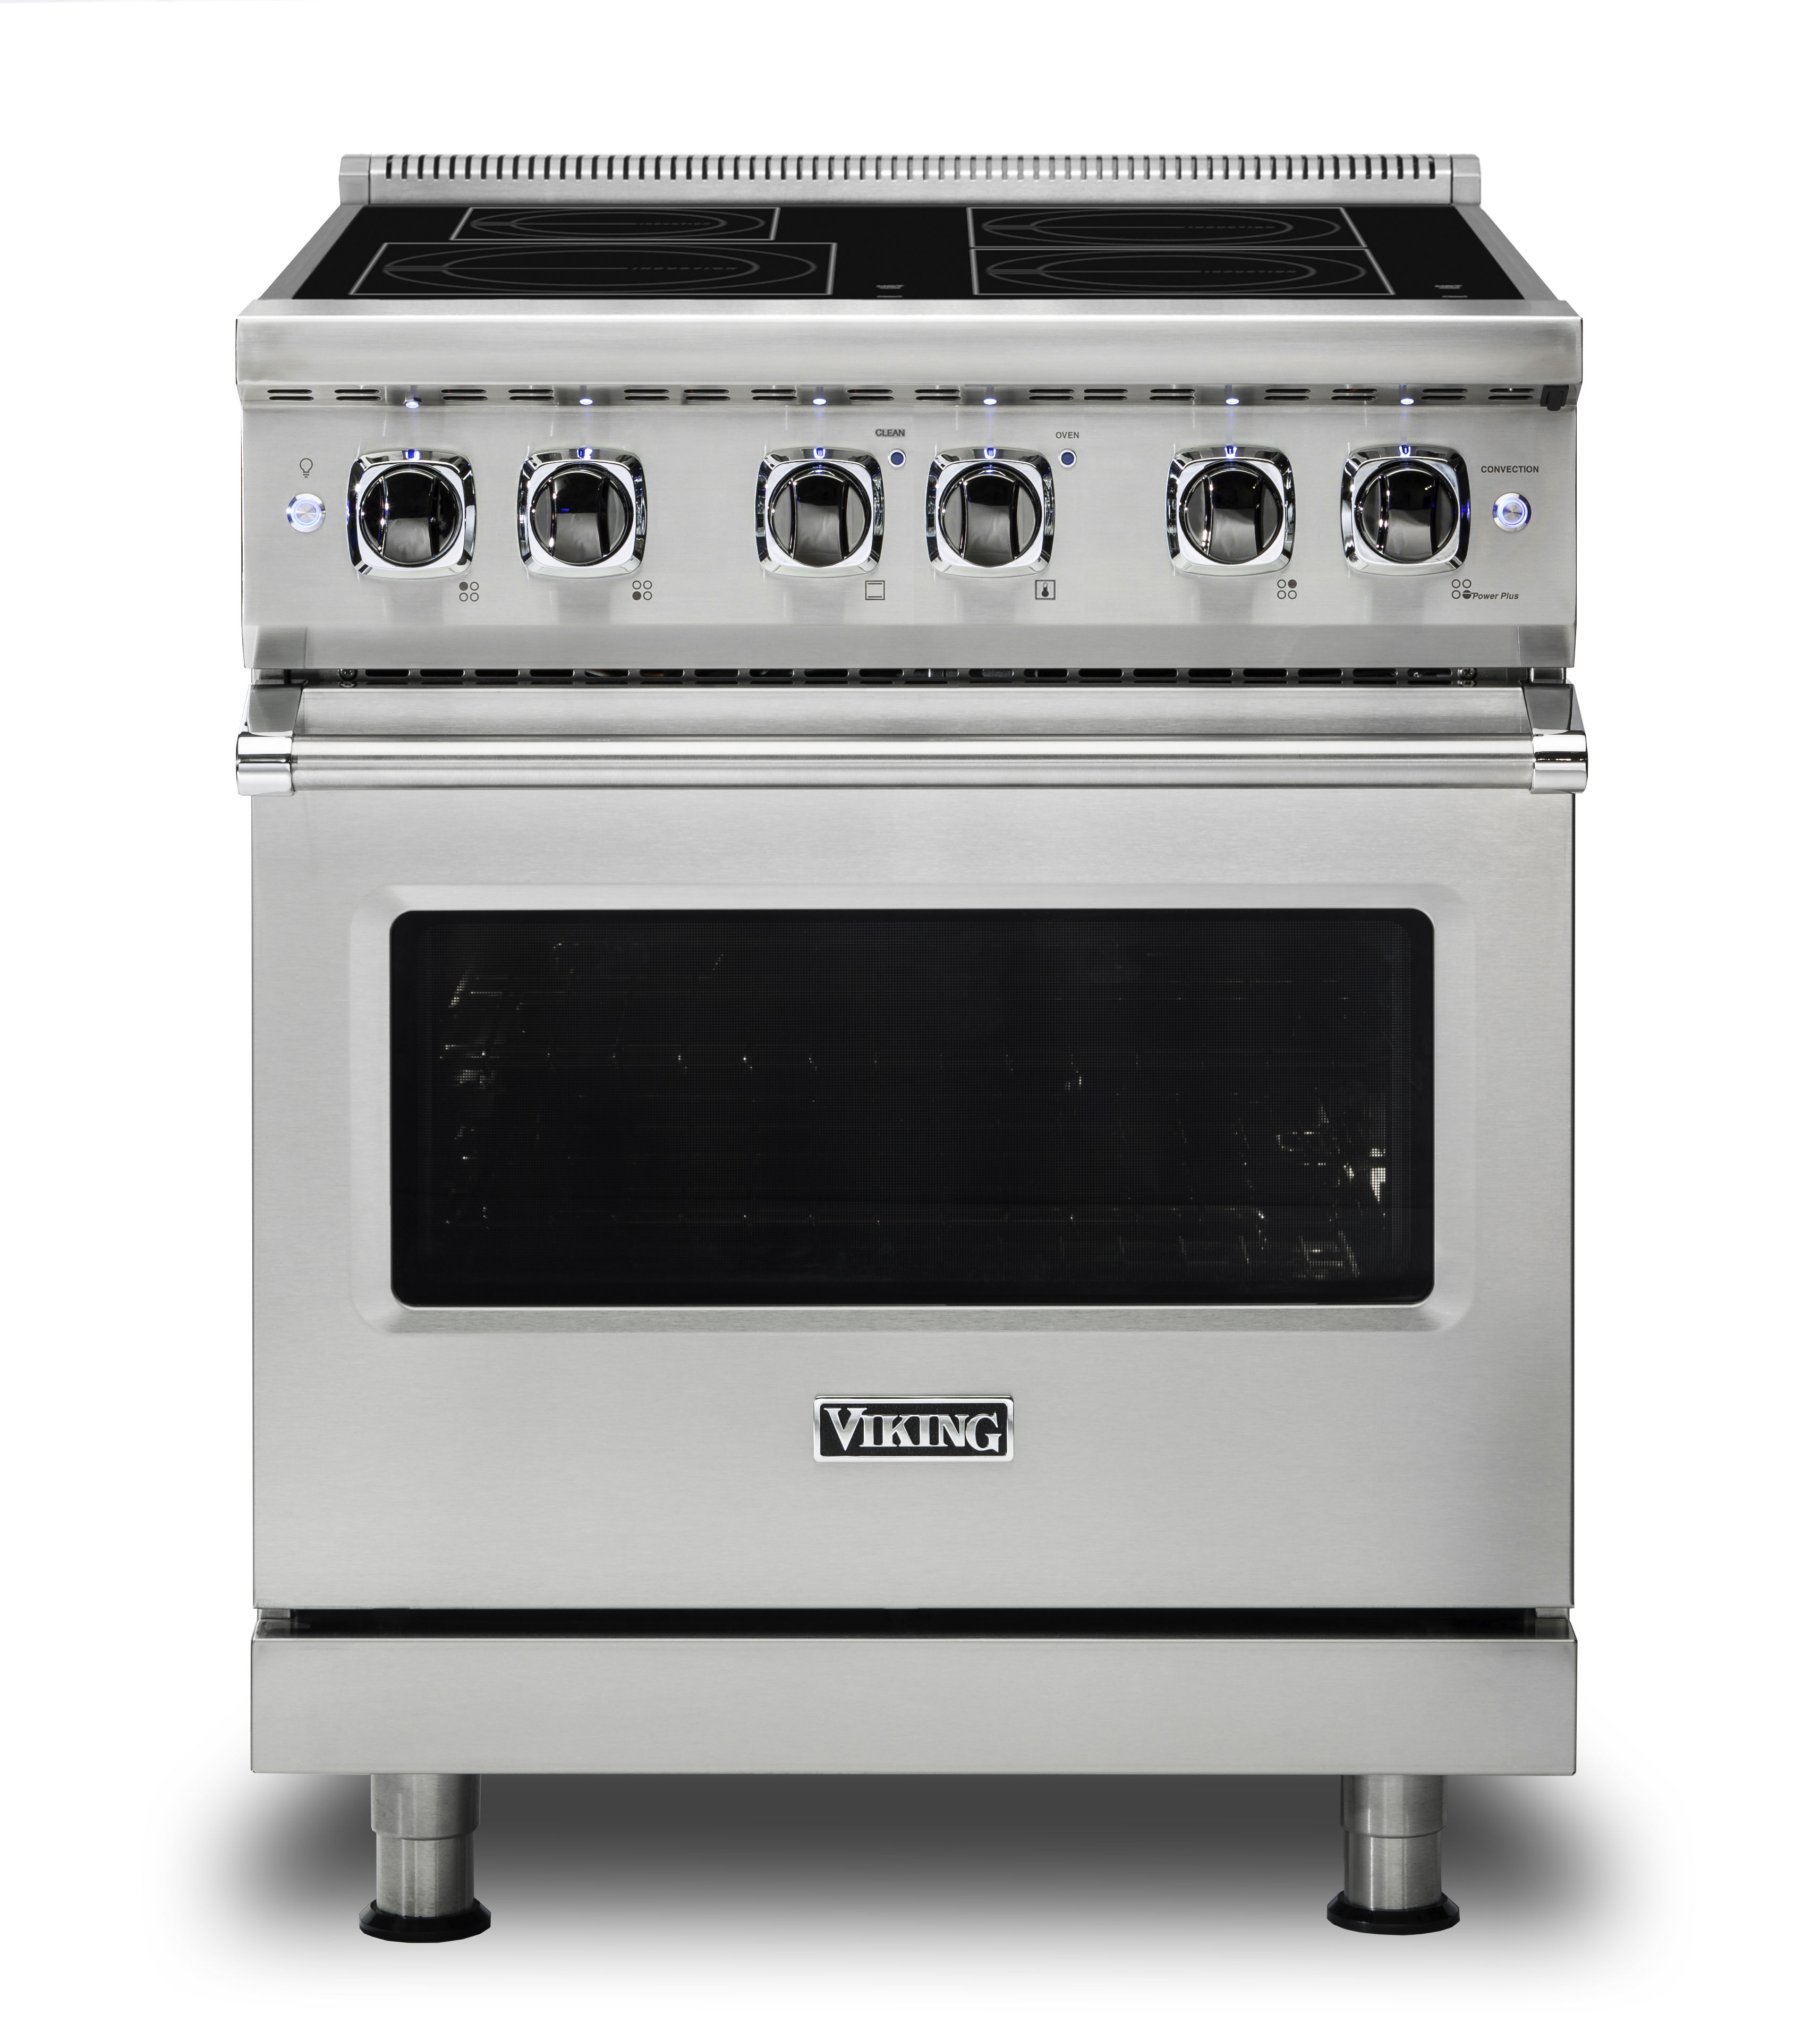 "Model: VIR53014BSS | Viking 30""W./24""D. Induction Self-Clean Range-4 Burners-Stainless"